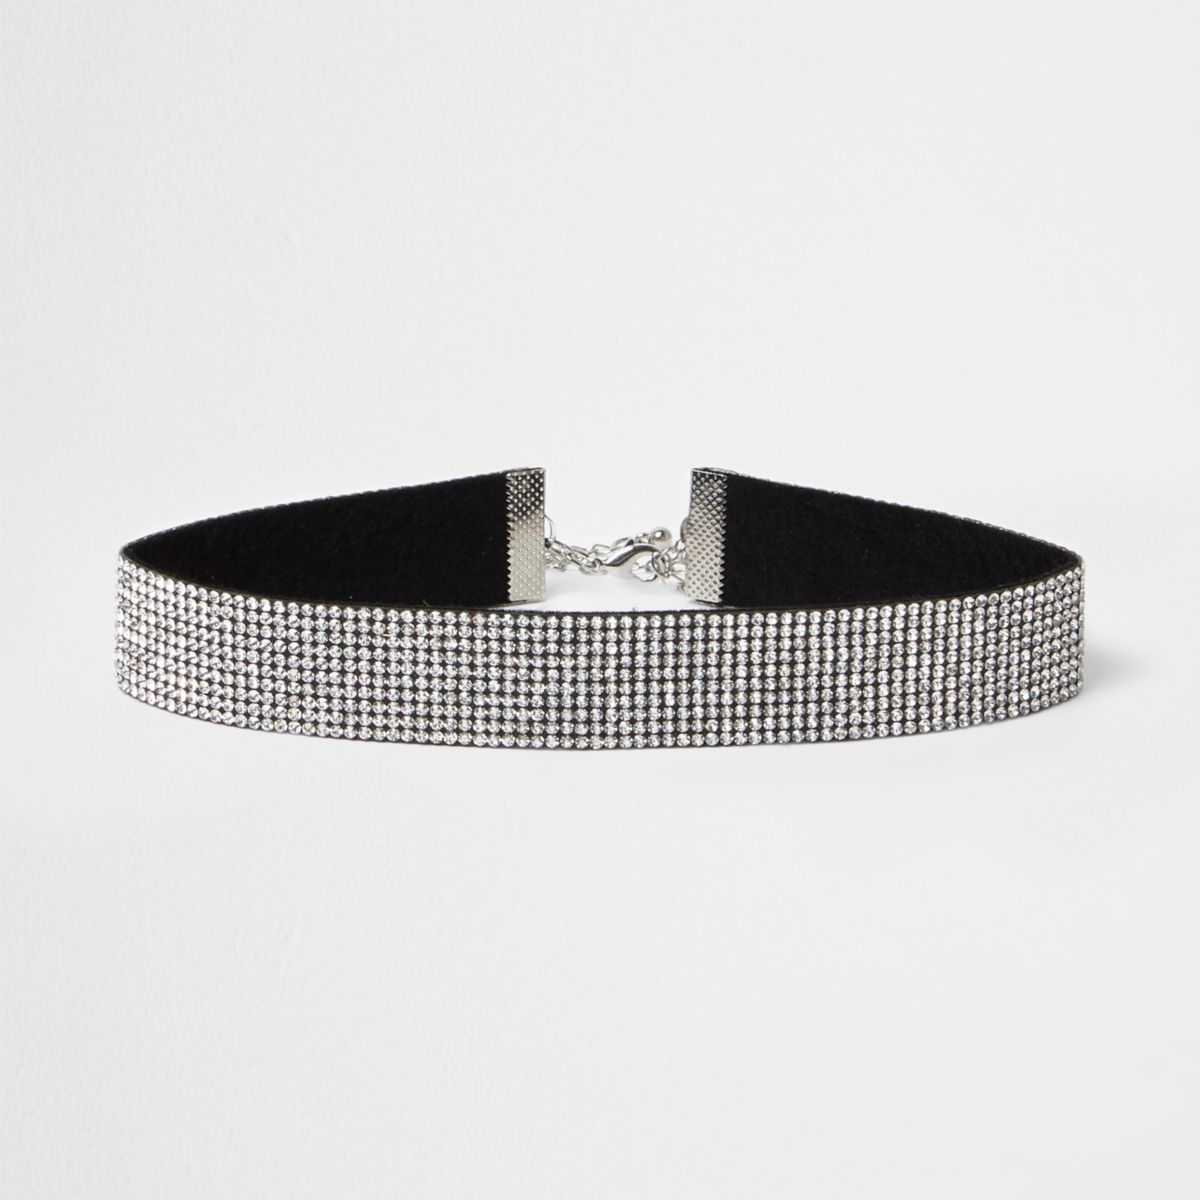 Silver tone heatseal diamante choker